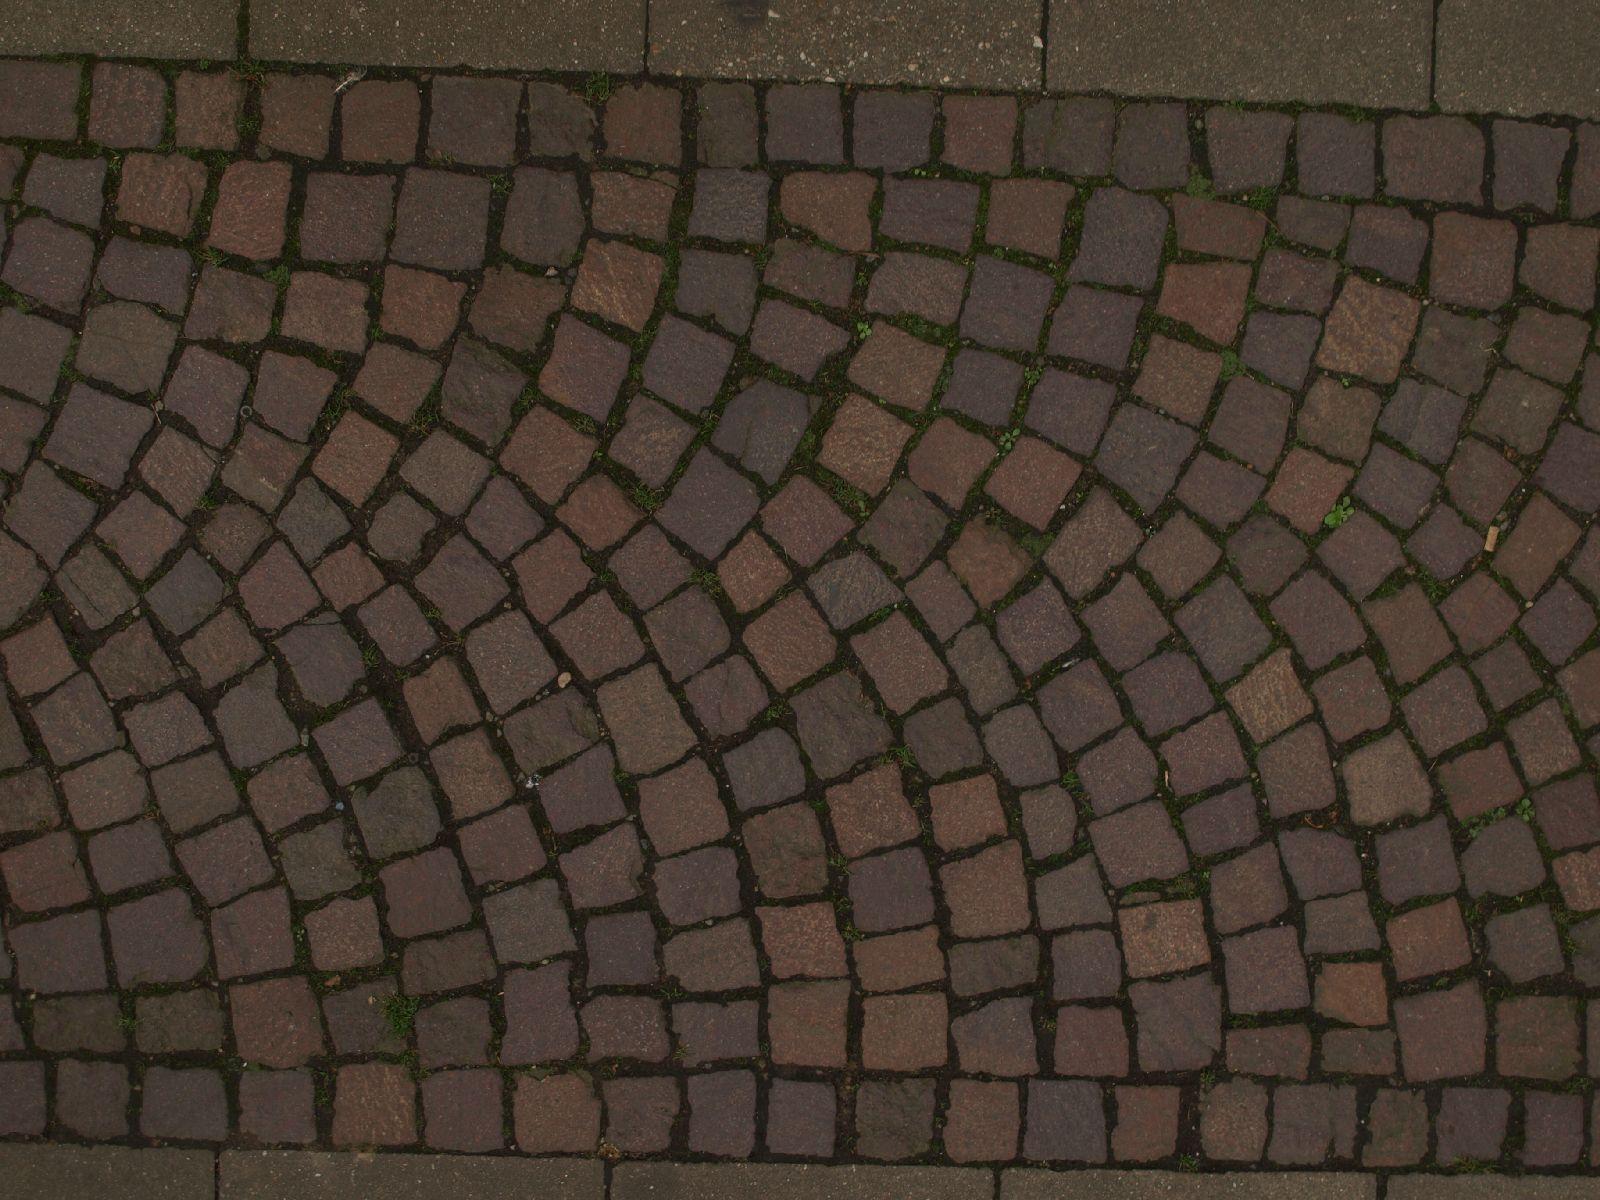 Boden-Gehweg-Strasse-Buergersteig-Textur_A_PA039940